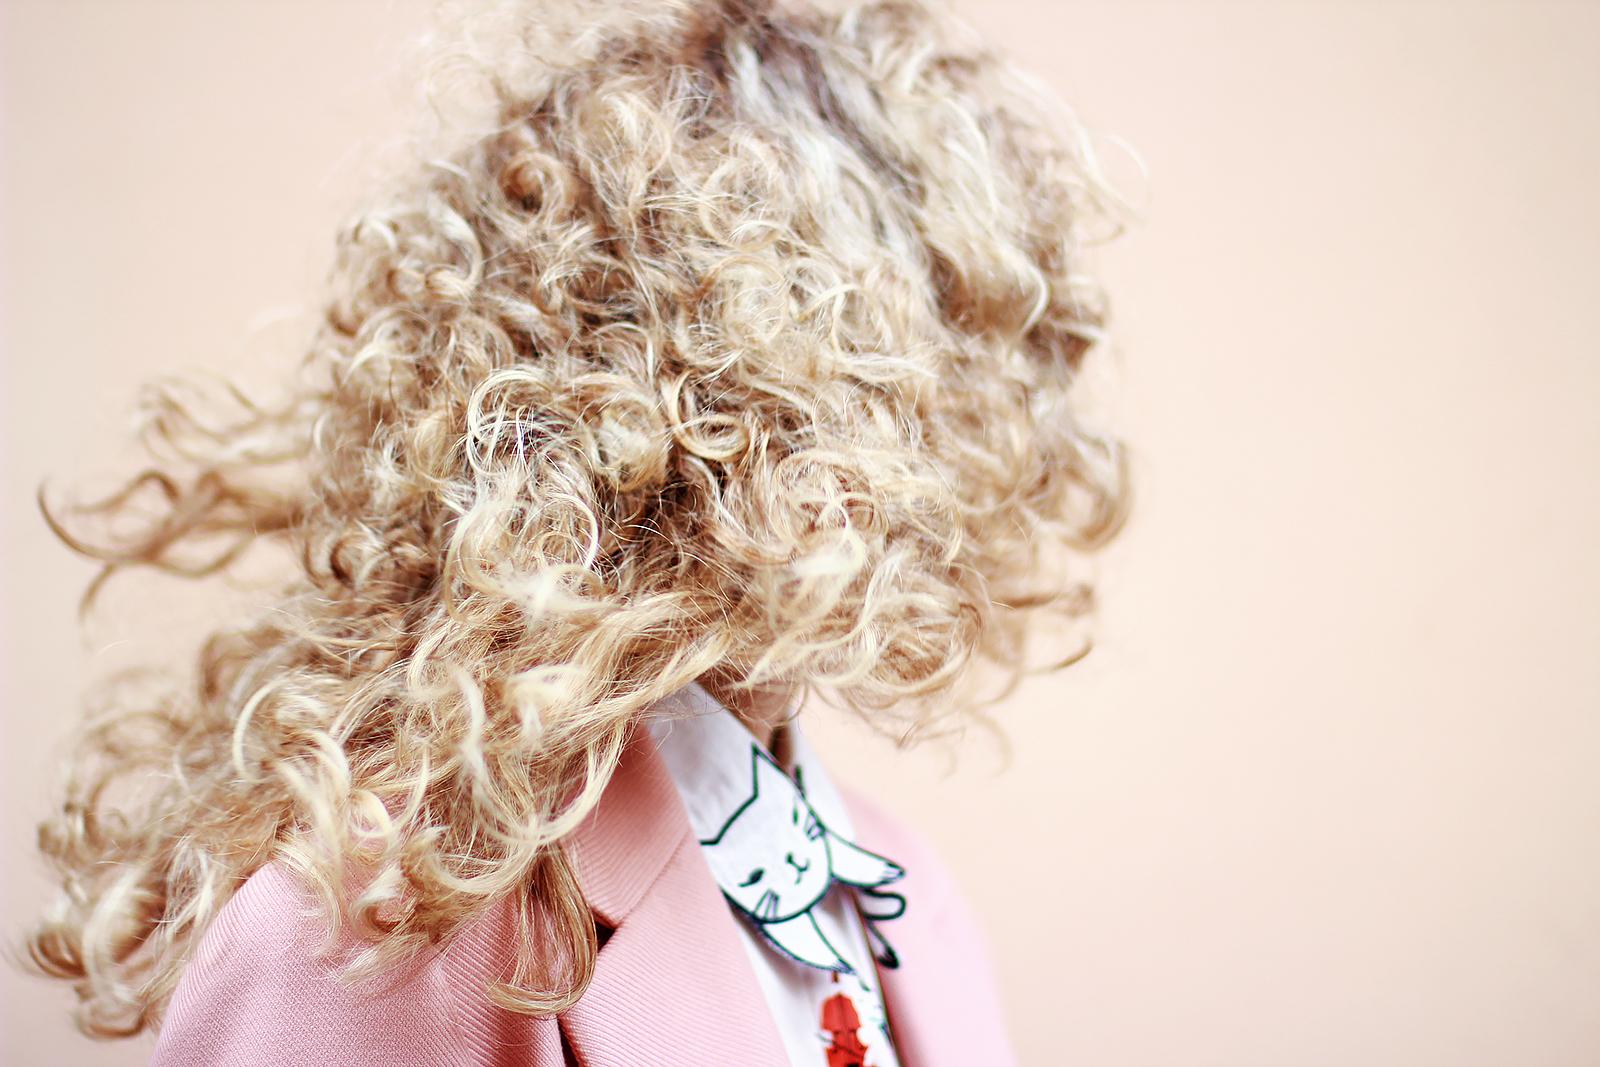 margarita_maslova_pink_coat_caramel_pants_cats_blouse_rose_quartz_bag_streetstyle_